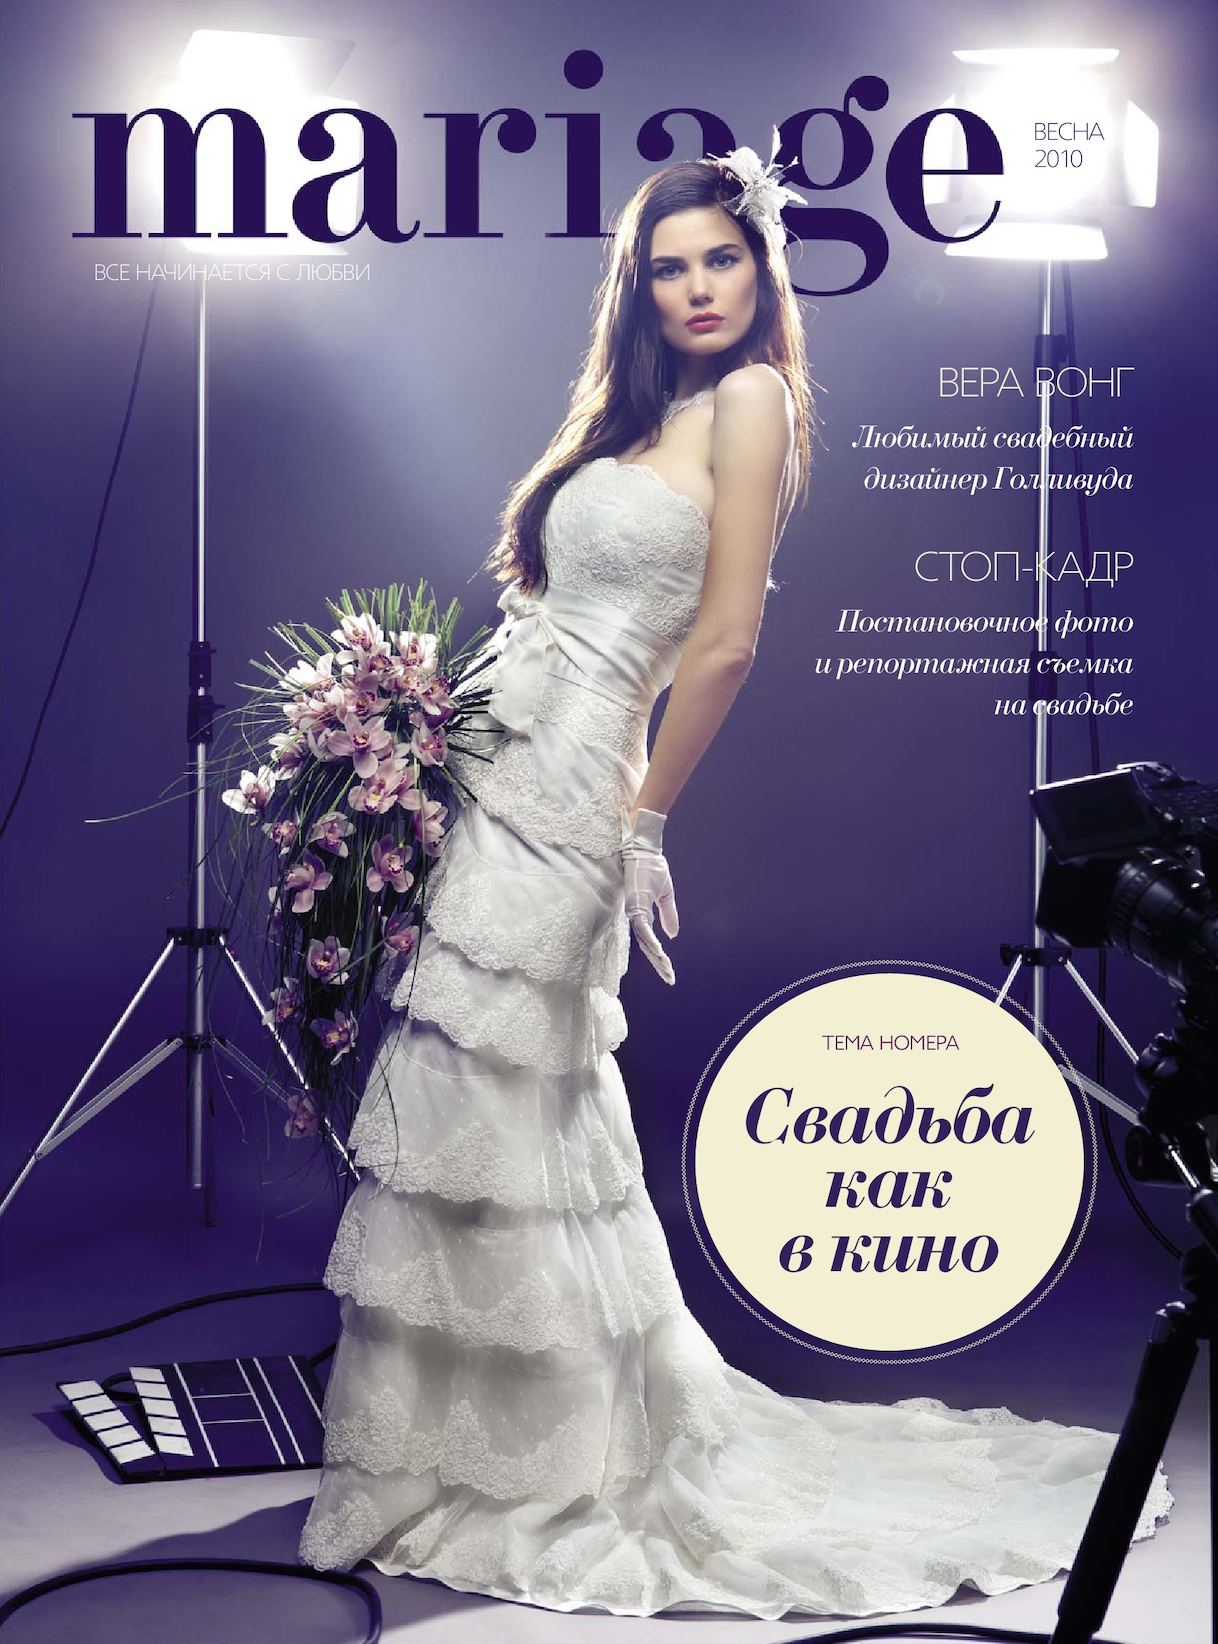 Mariage (Весна 2010)